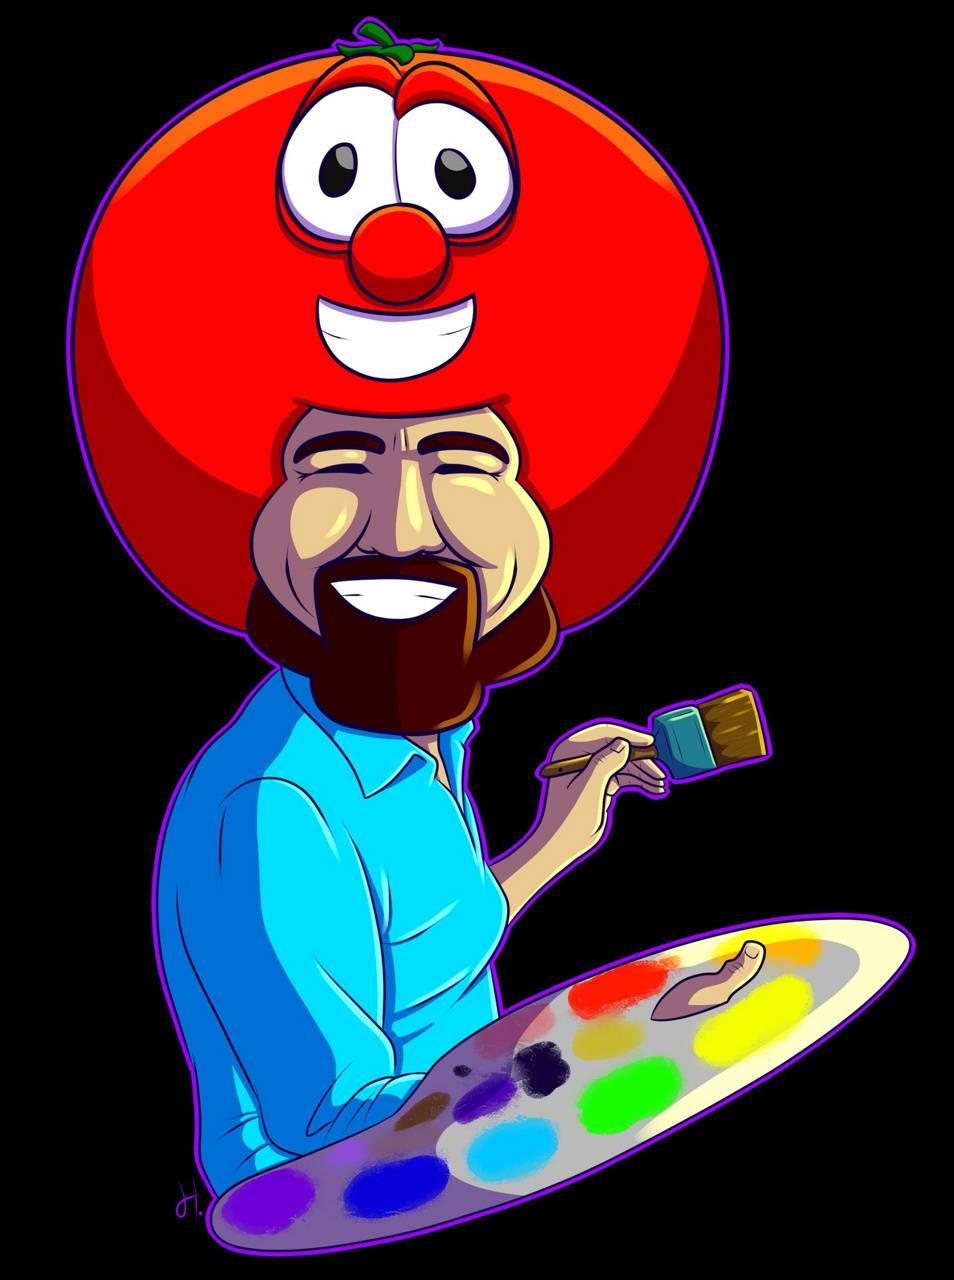 Bob the Tomato Ross